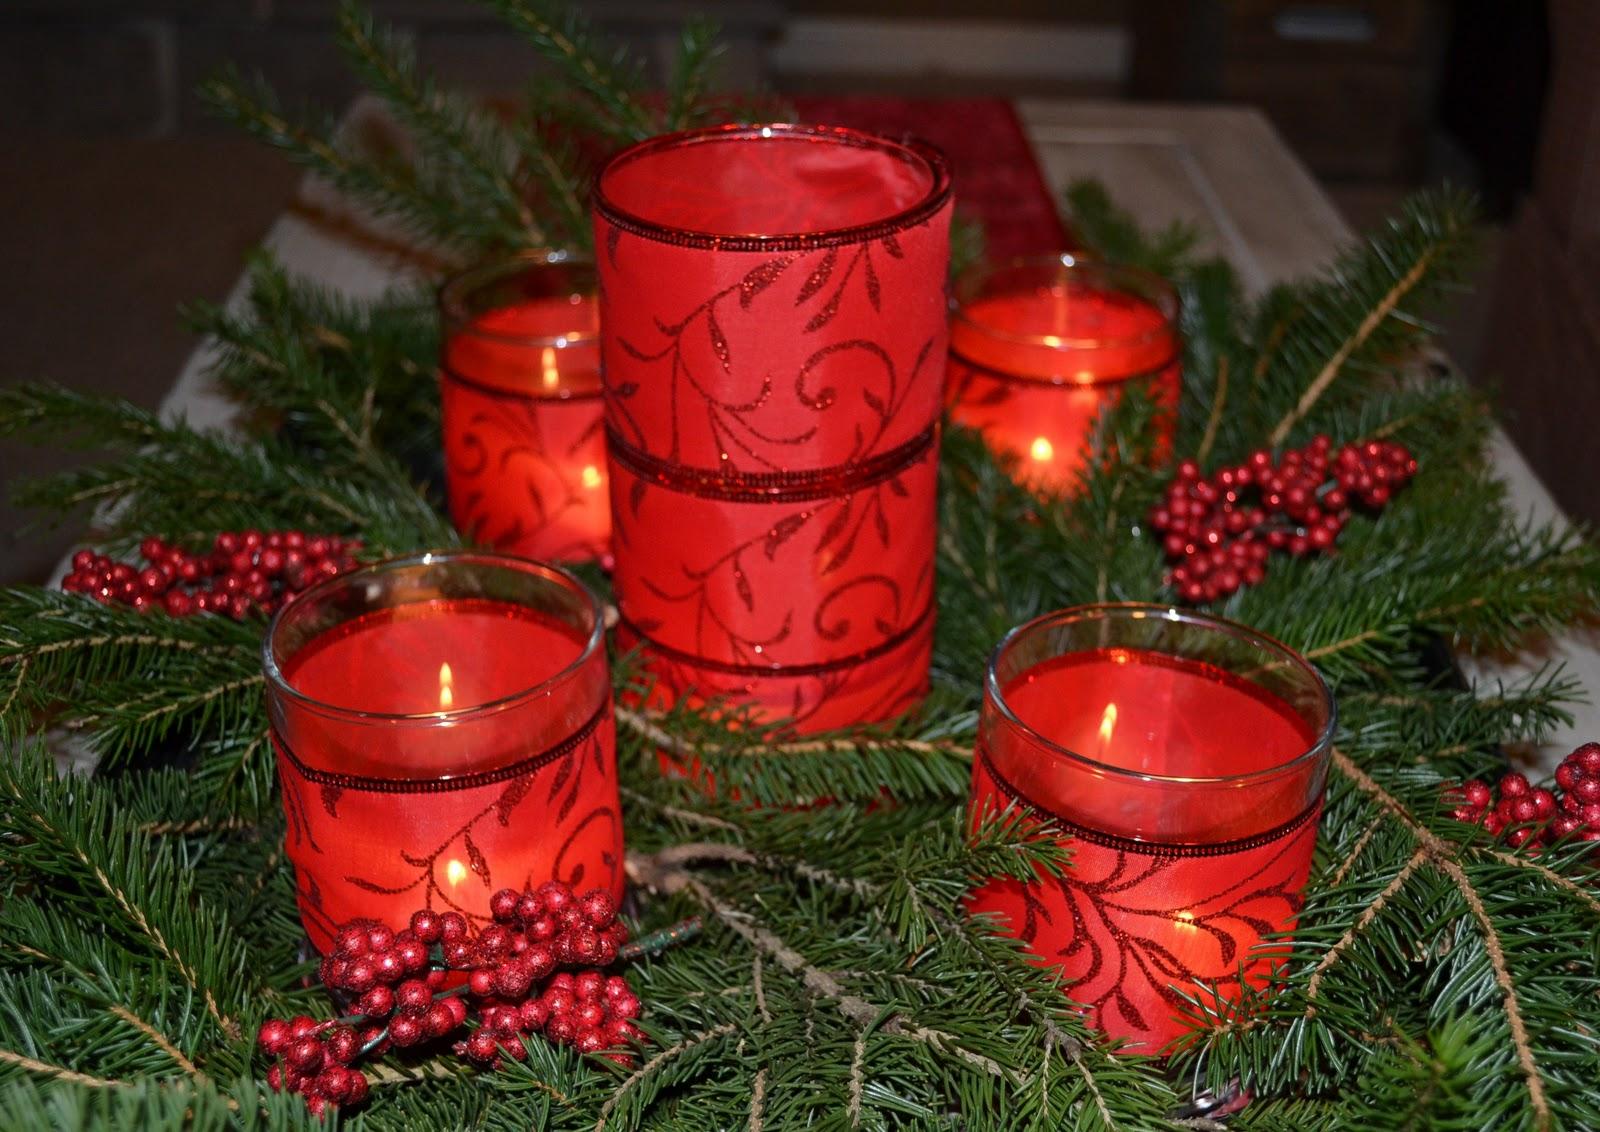 Advent Wreath Decorations Thrifty Decorating Dollar Tree Advent Wreath